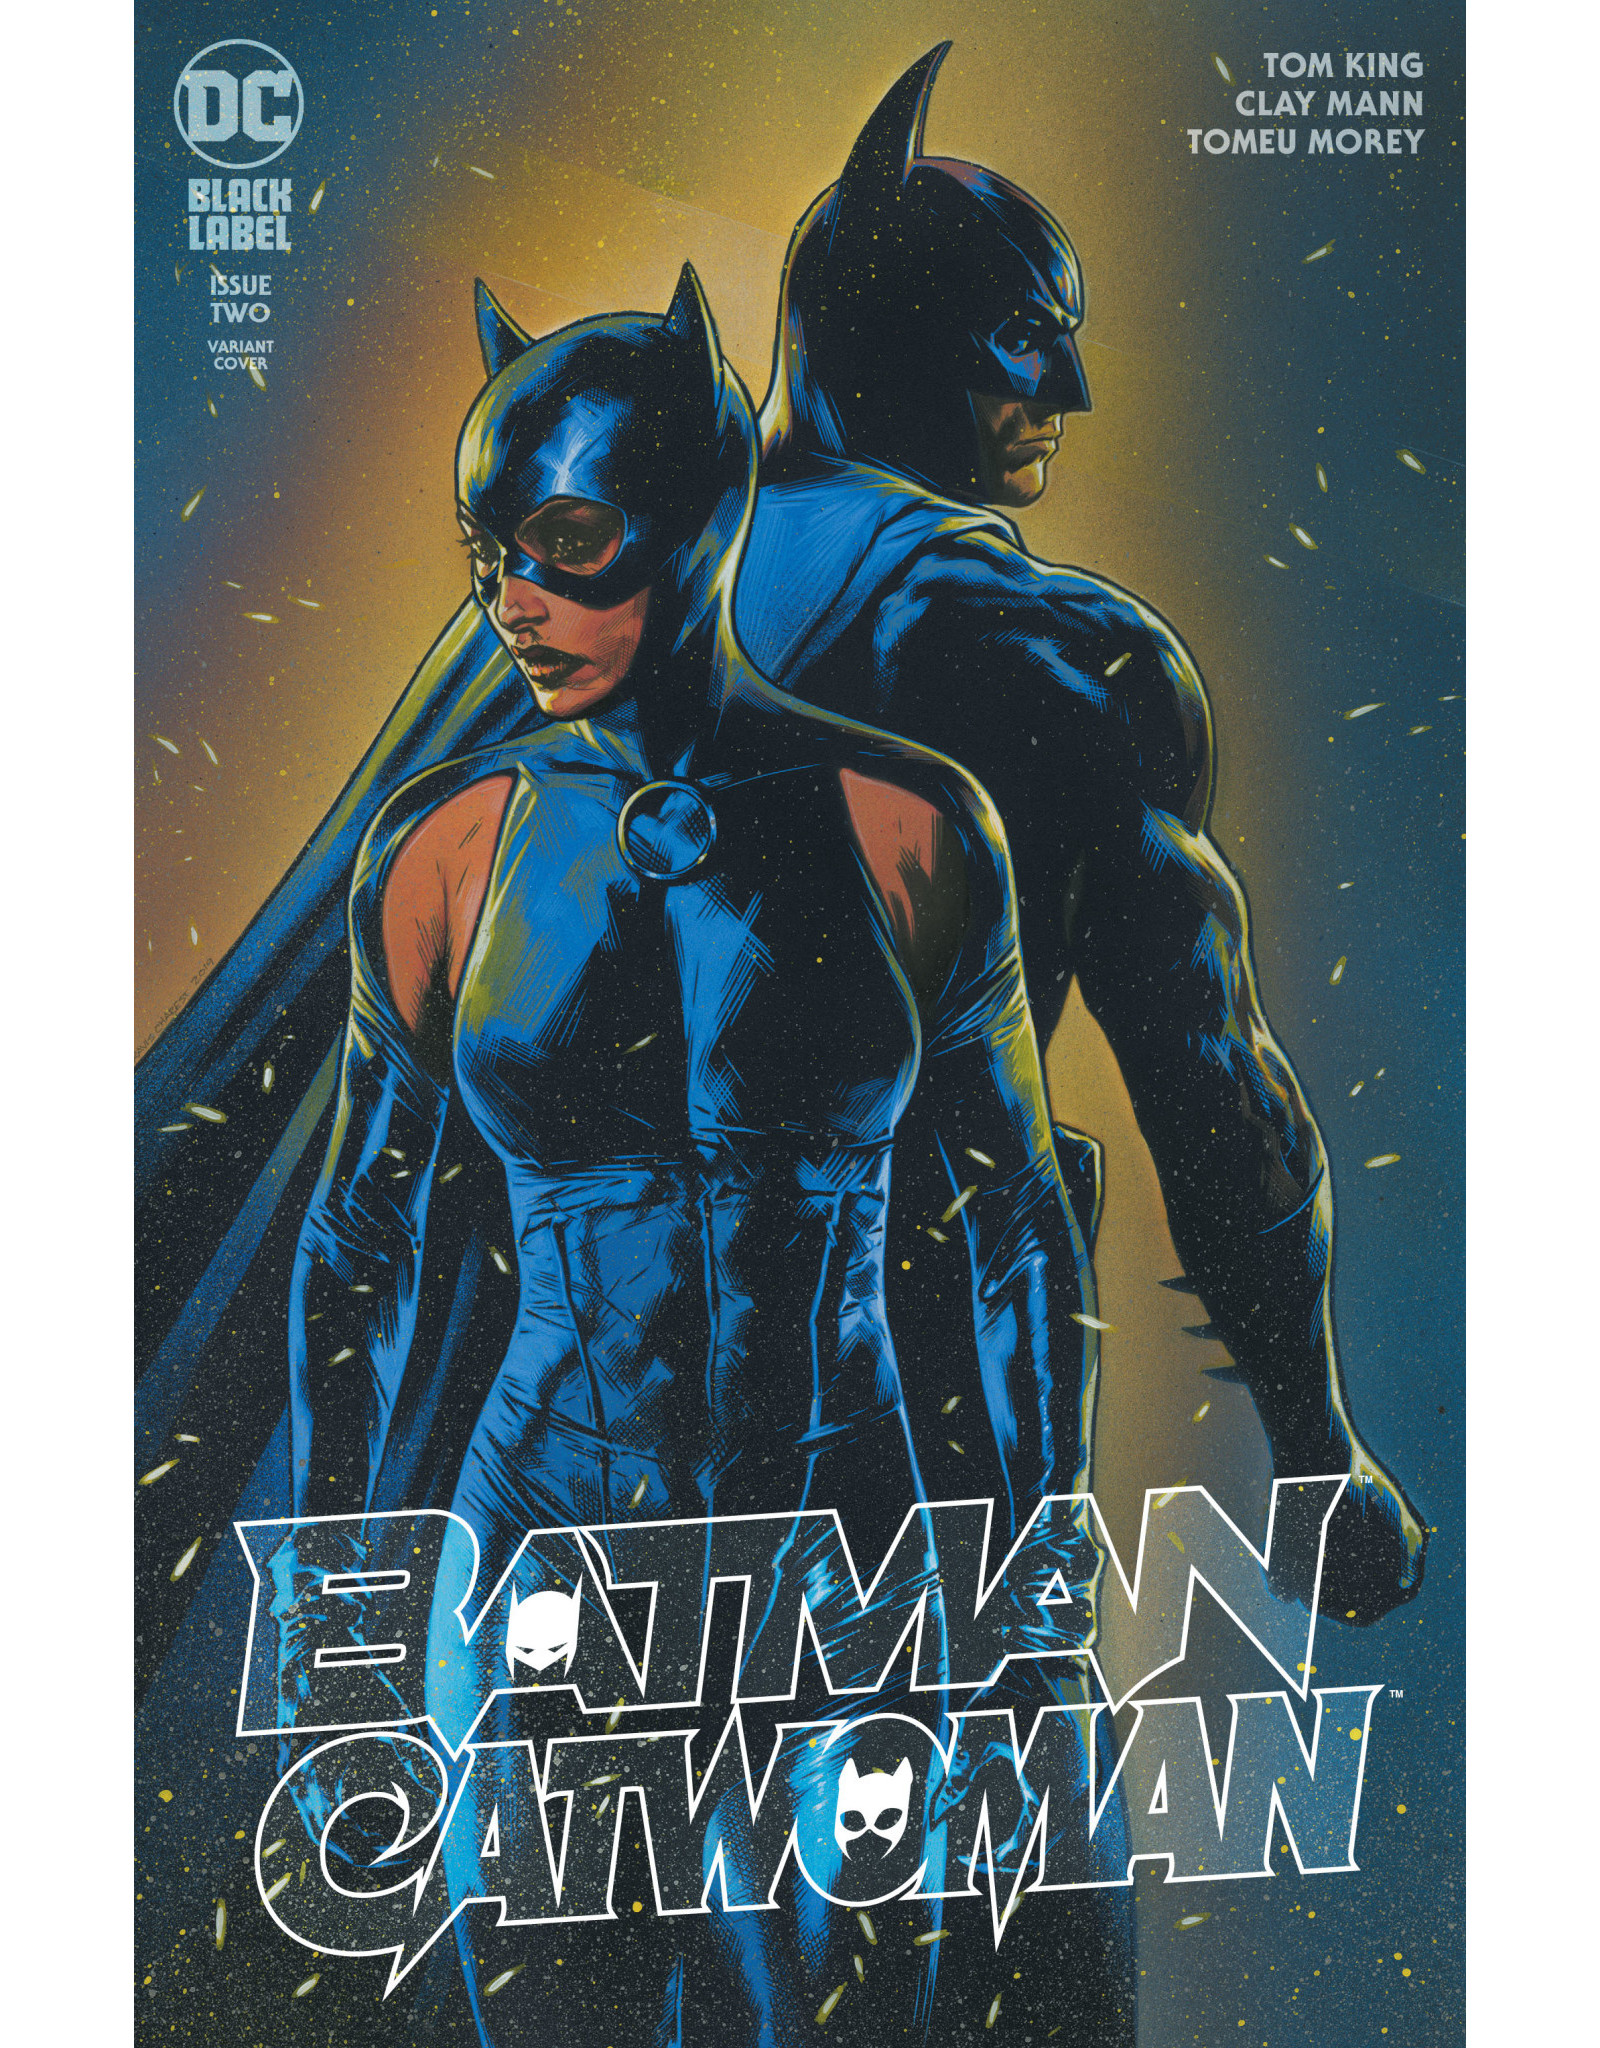 DC Comics BATMAN CATWOMAN #2 (OF 12) CVR C TRAVIS CHAREST VAR